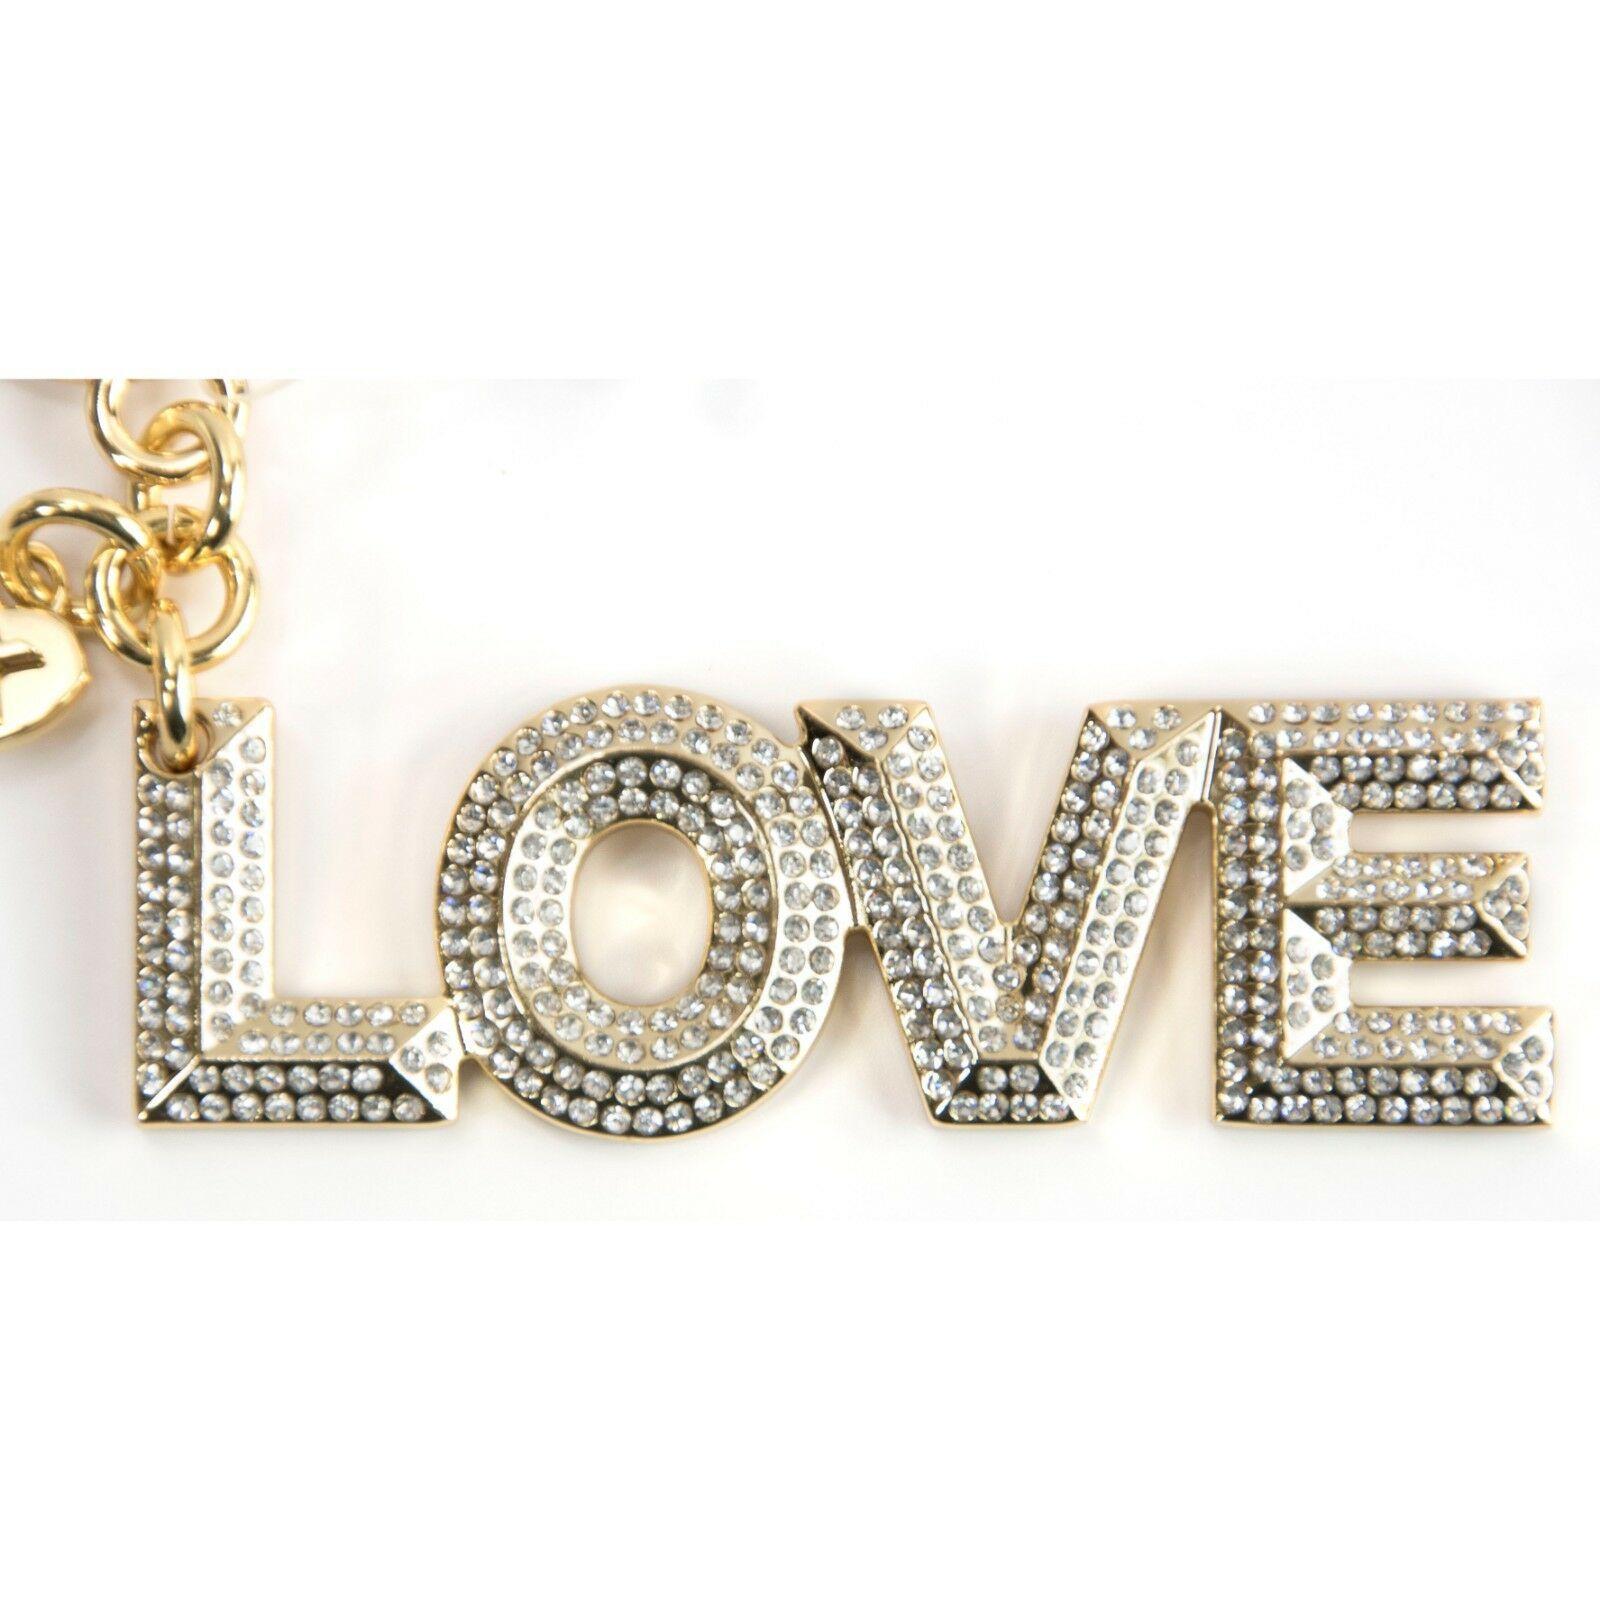 Michael Kors Gold Pave Crystal Pyramid Stud Love Key Chain Bag Charm NWT